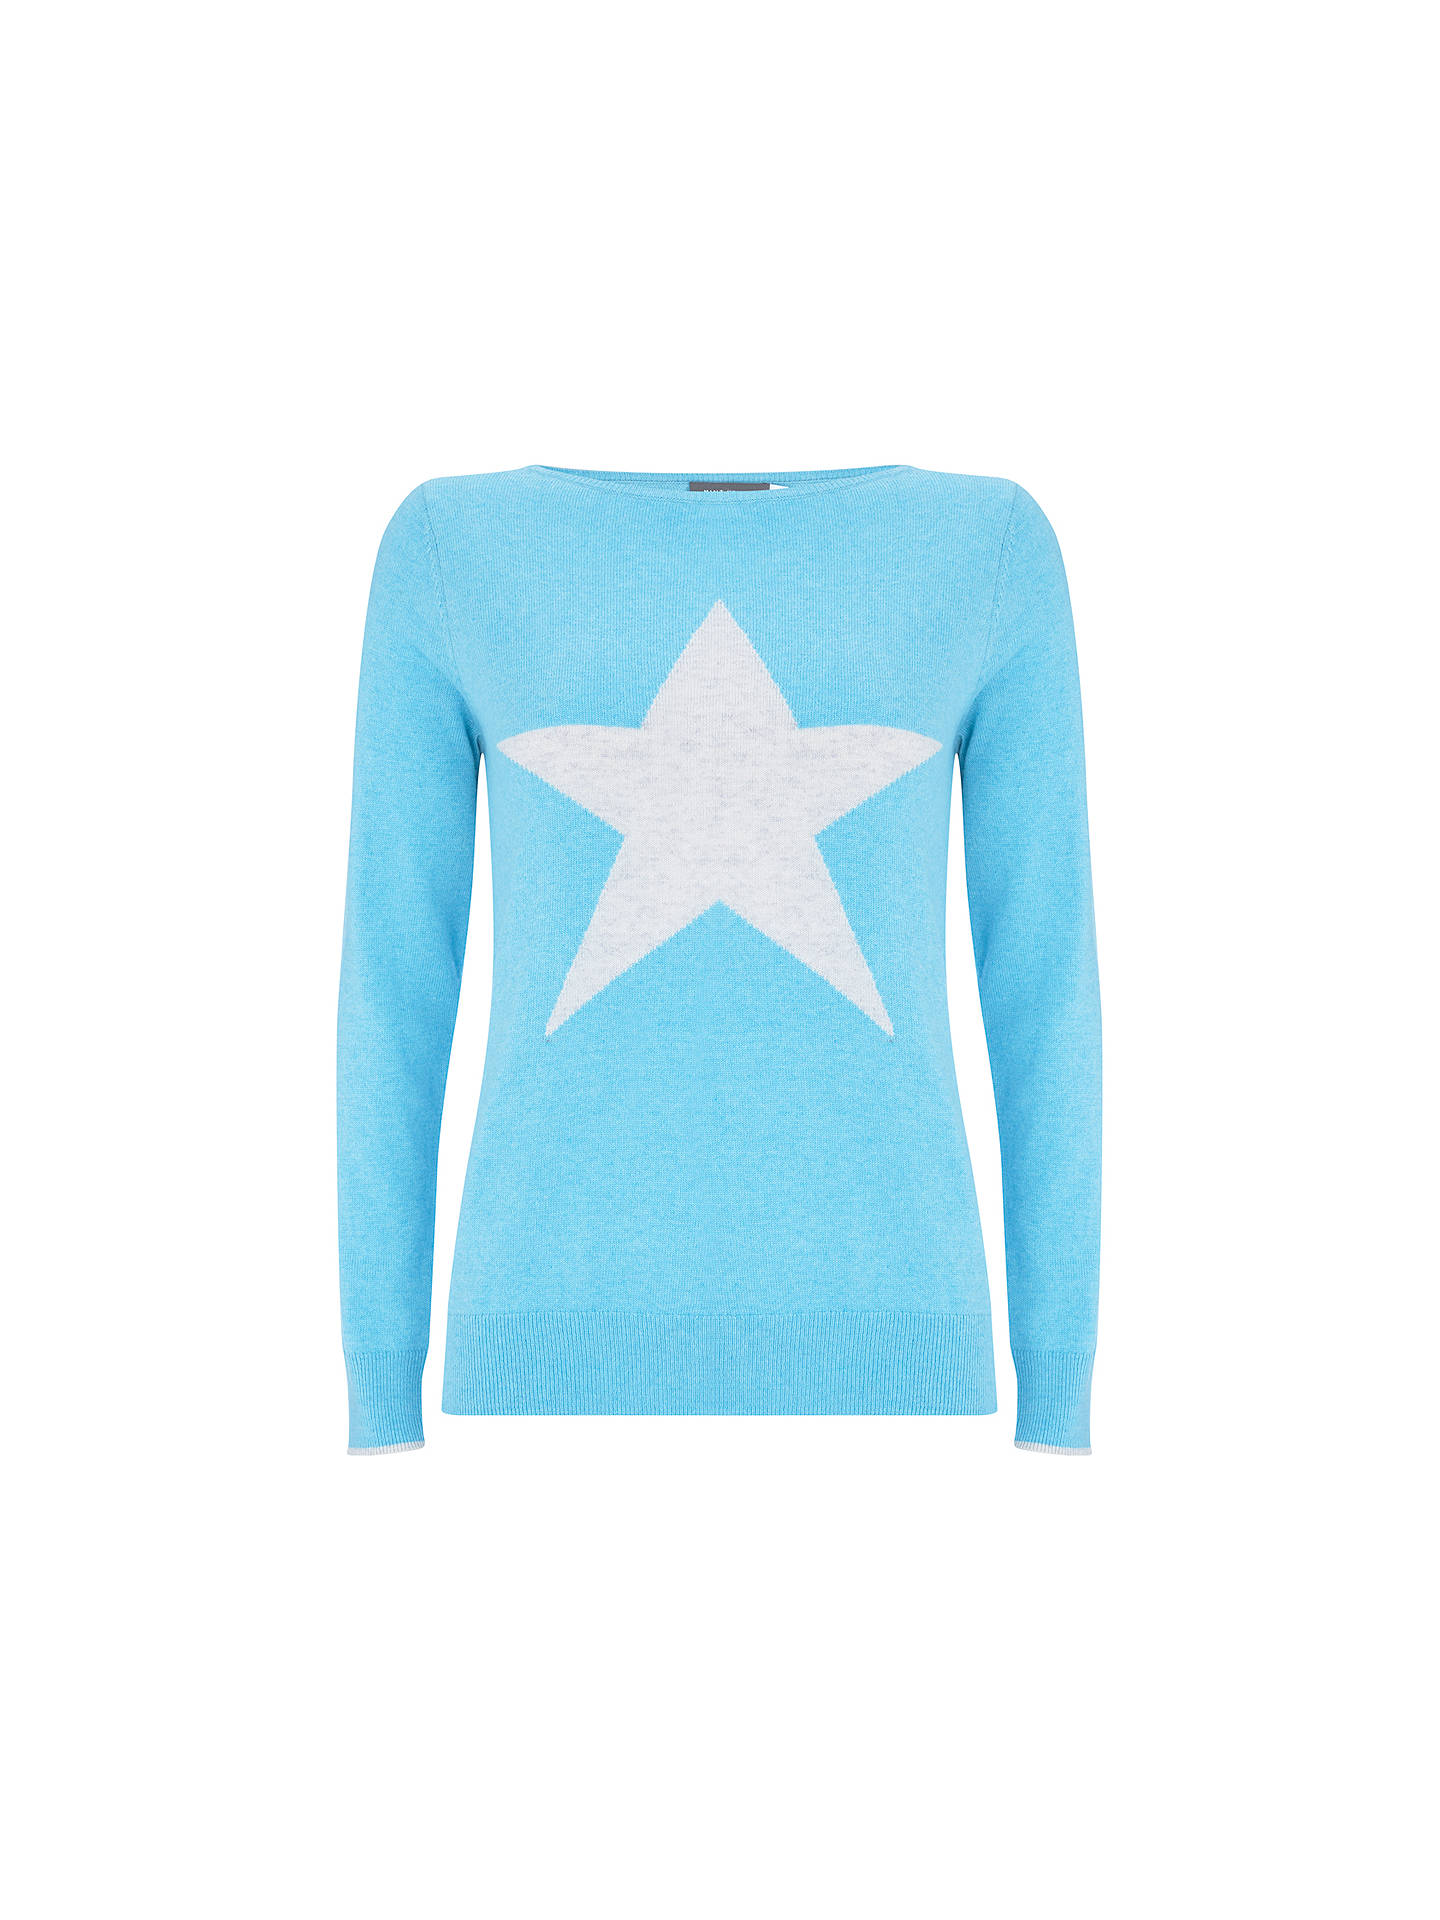 ae2a1051c4a9 Buy Mint Velvet Star Crew Neck Jumper, Light Blue, 6 Online at johnlewis.